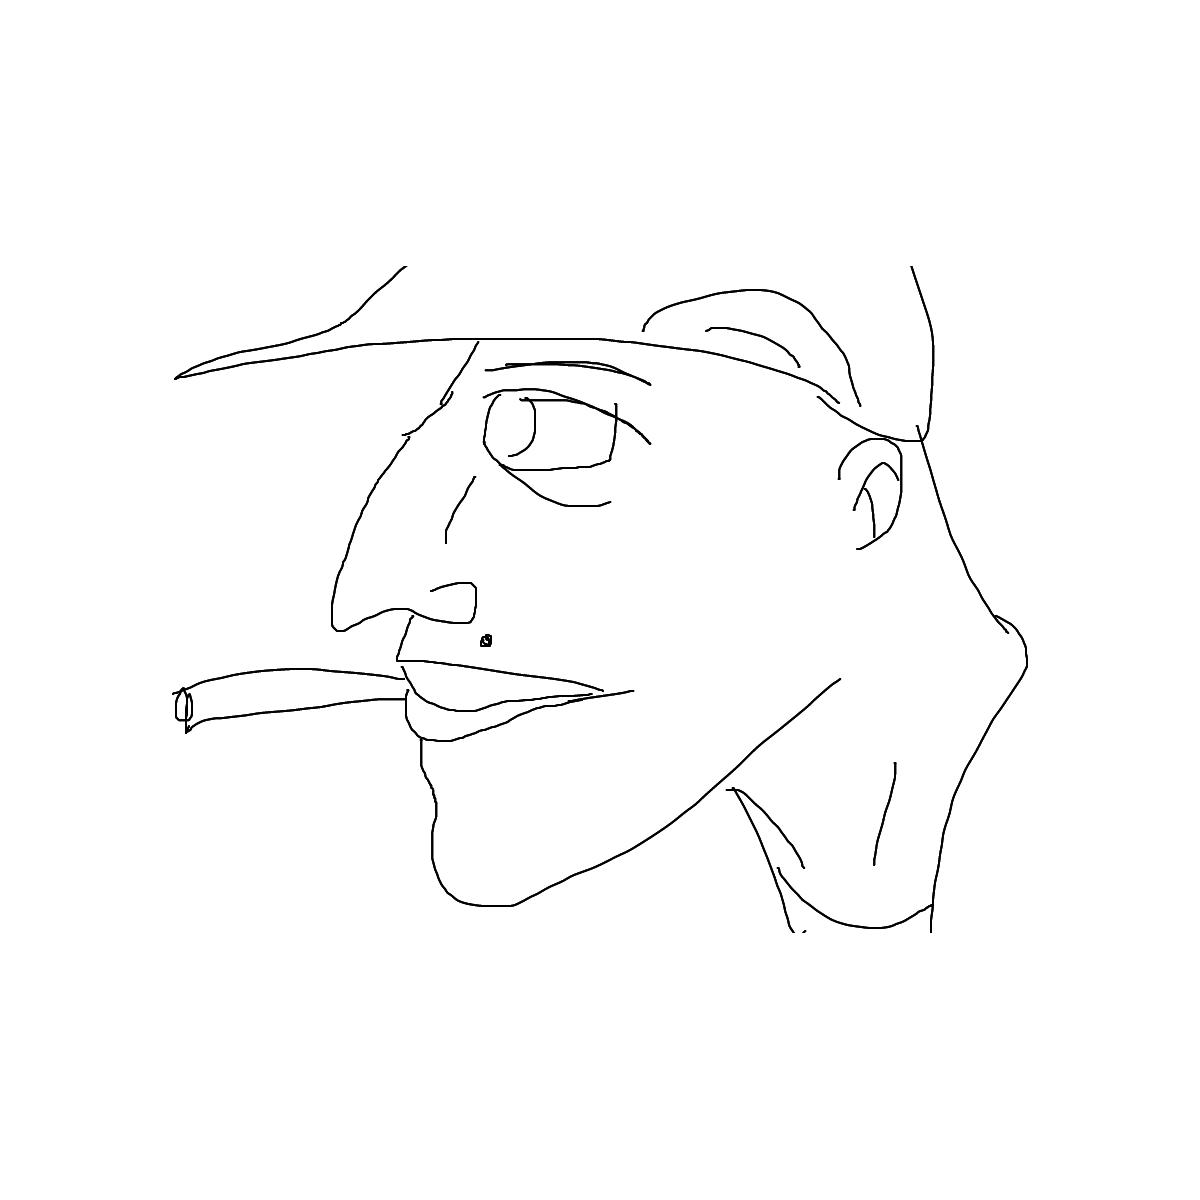 BAAAM drawing#9033 lat:54.6729583740234400lng: 25.2752380371093750